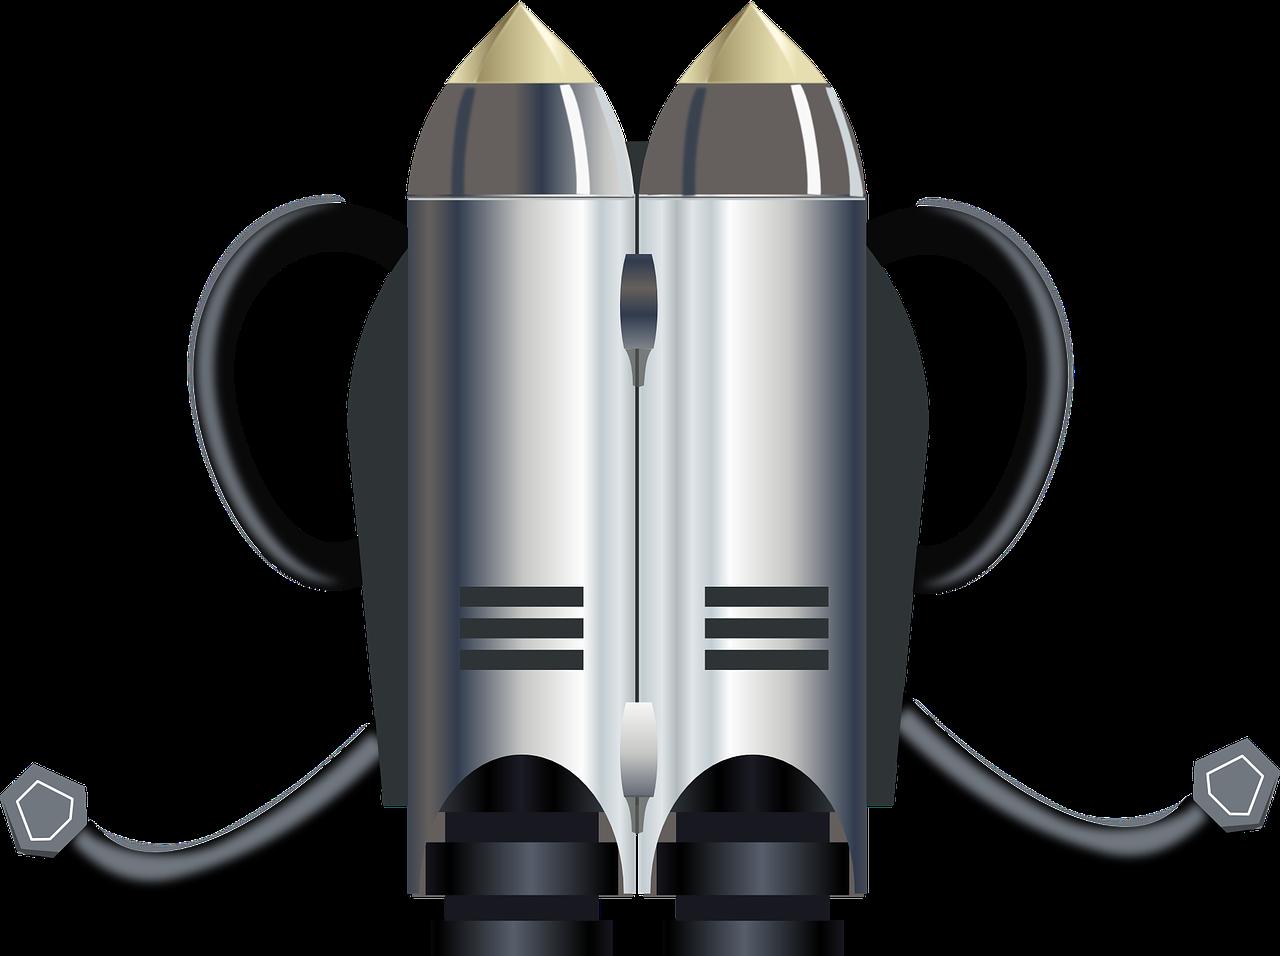 Future clipart rocket scientist. Jetpack rockets science png